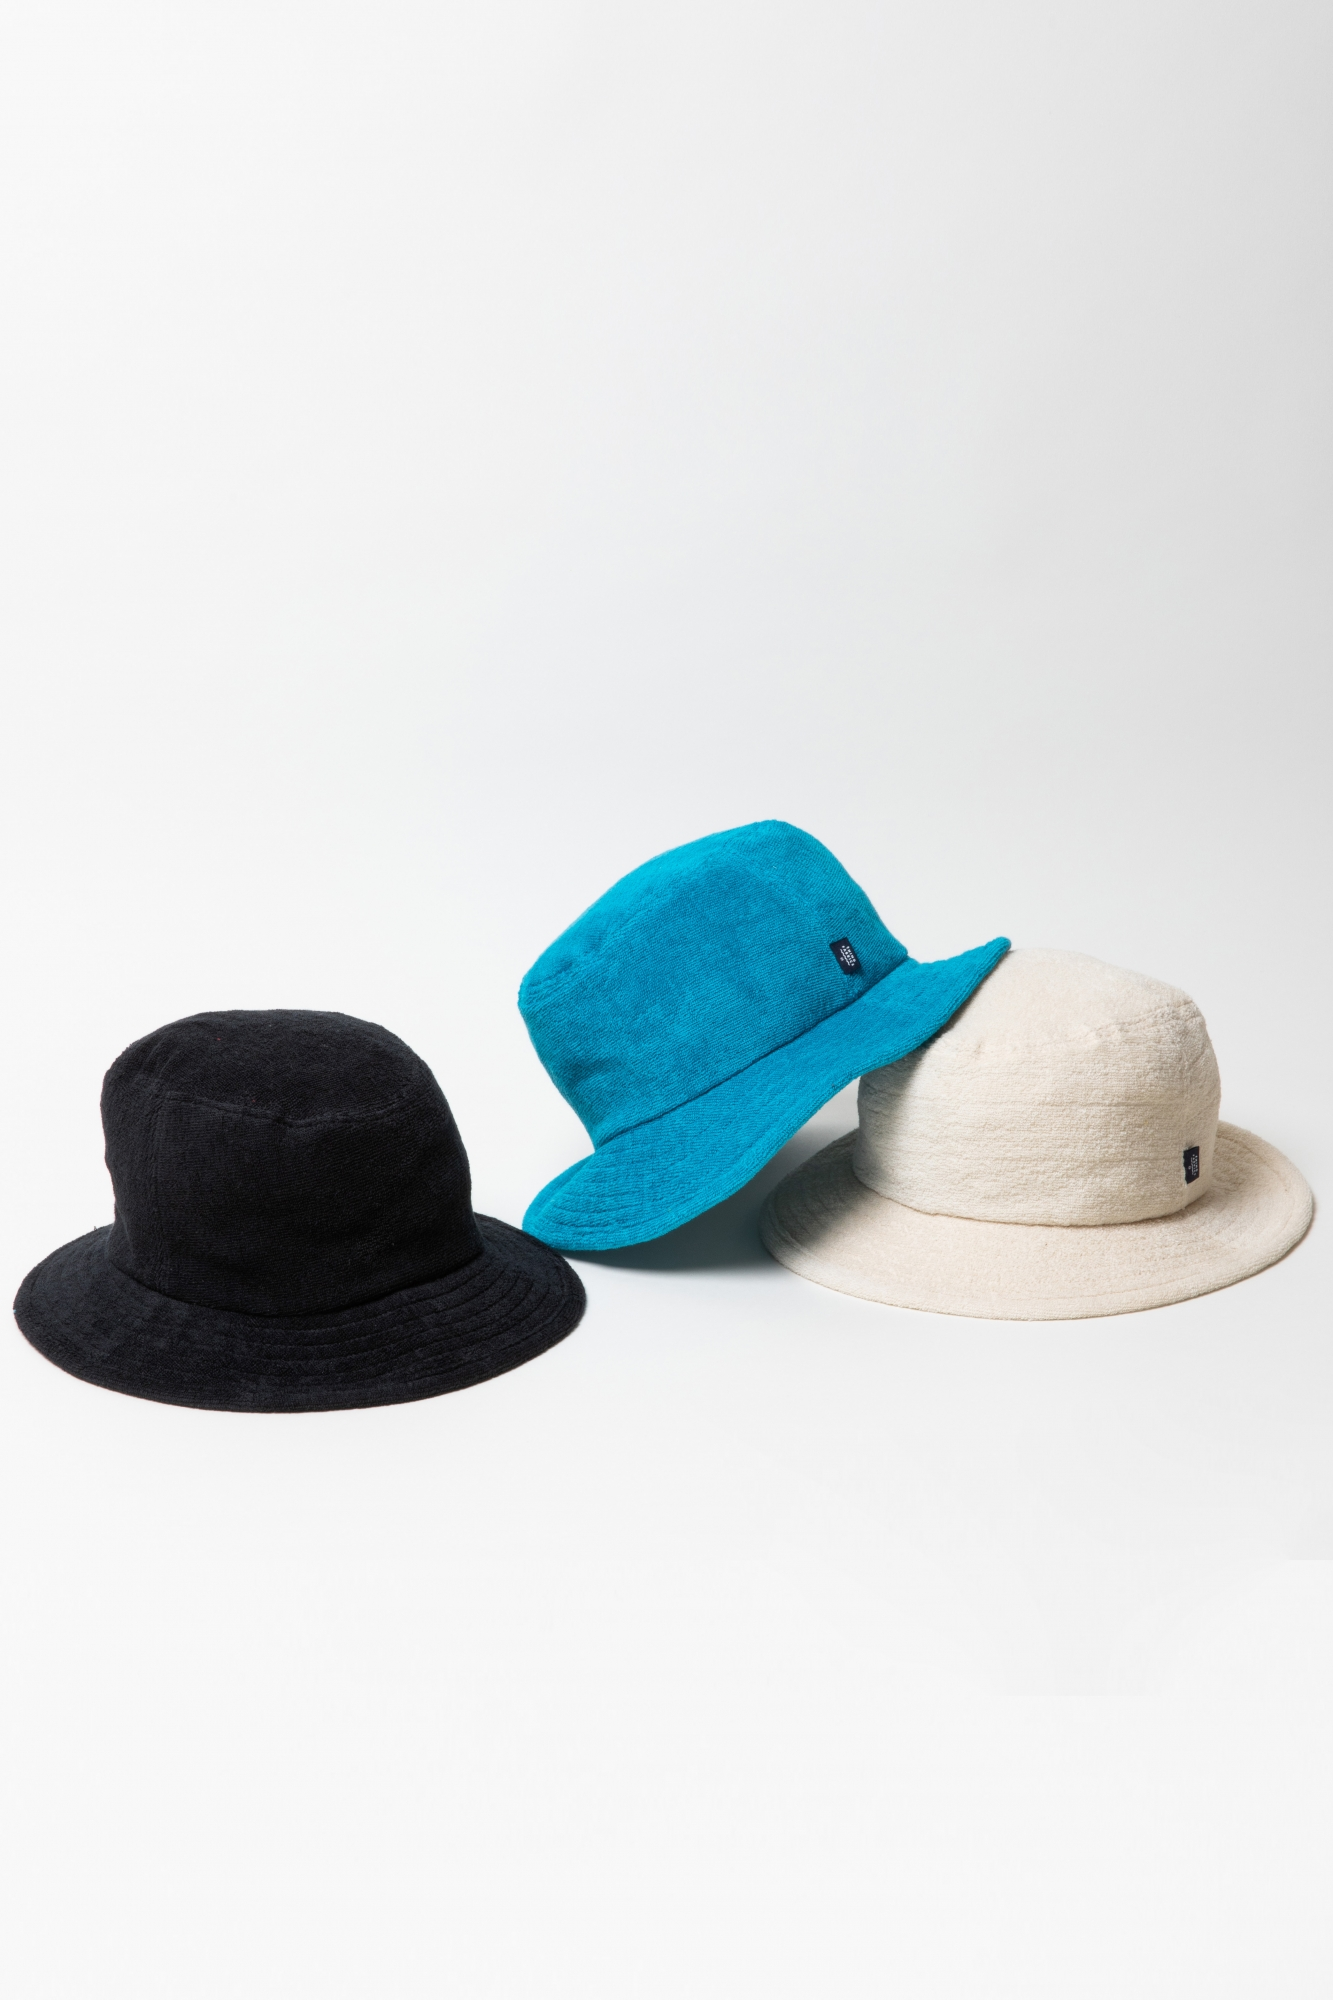 グッズ 帽子